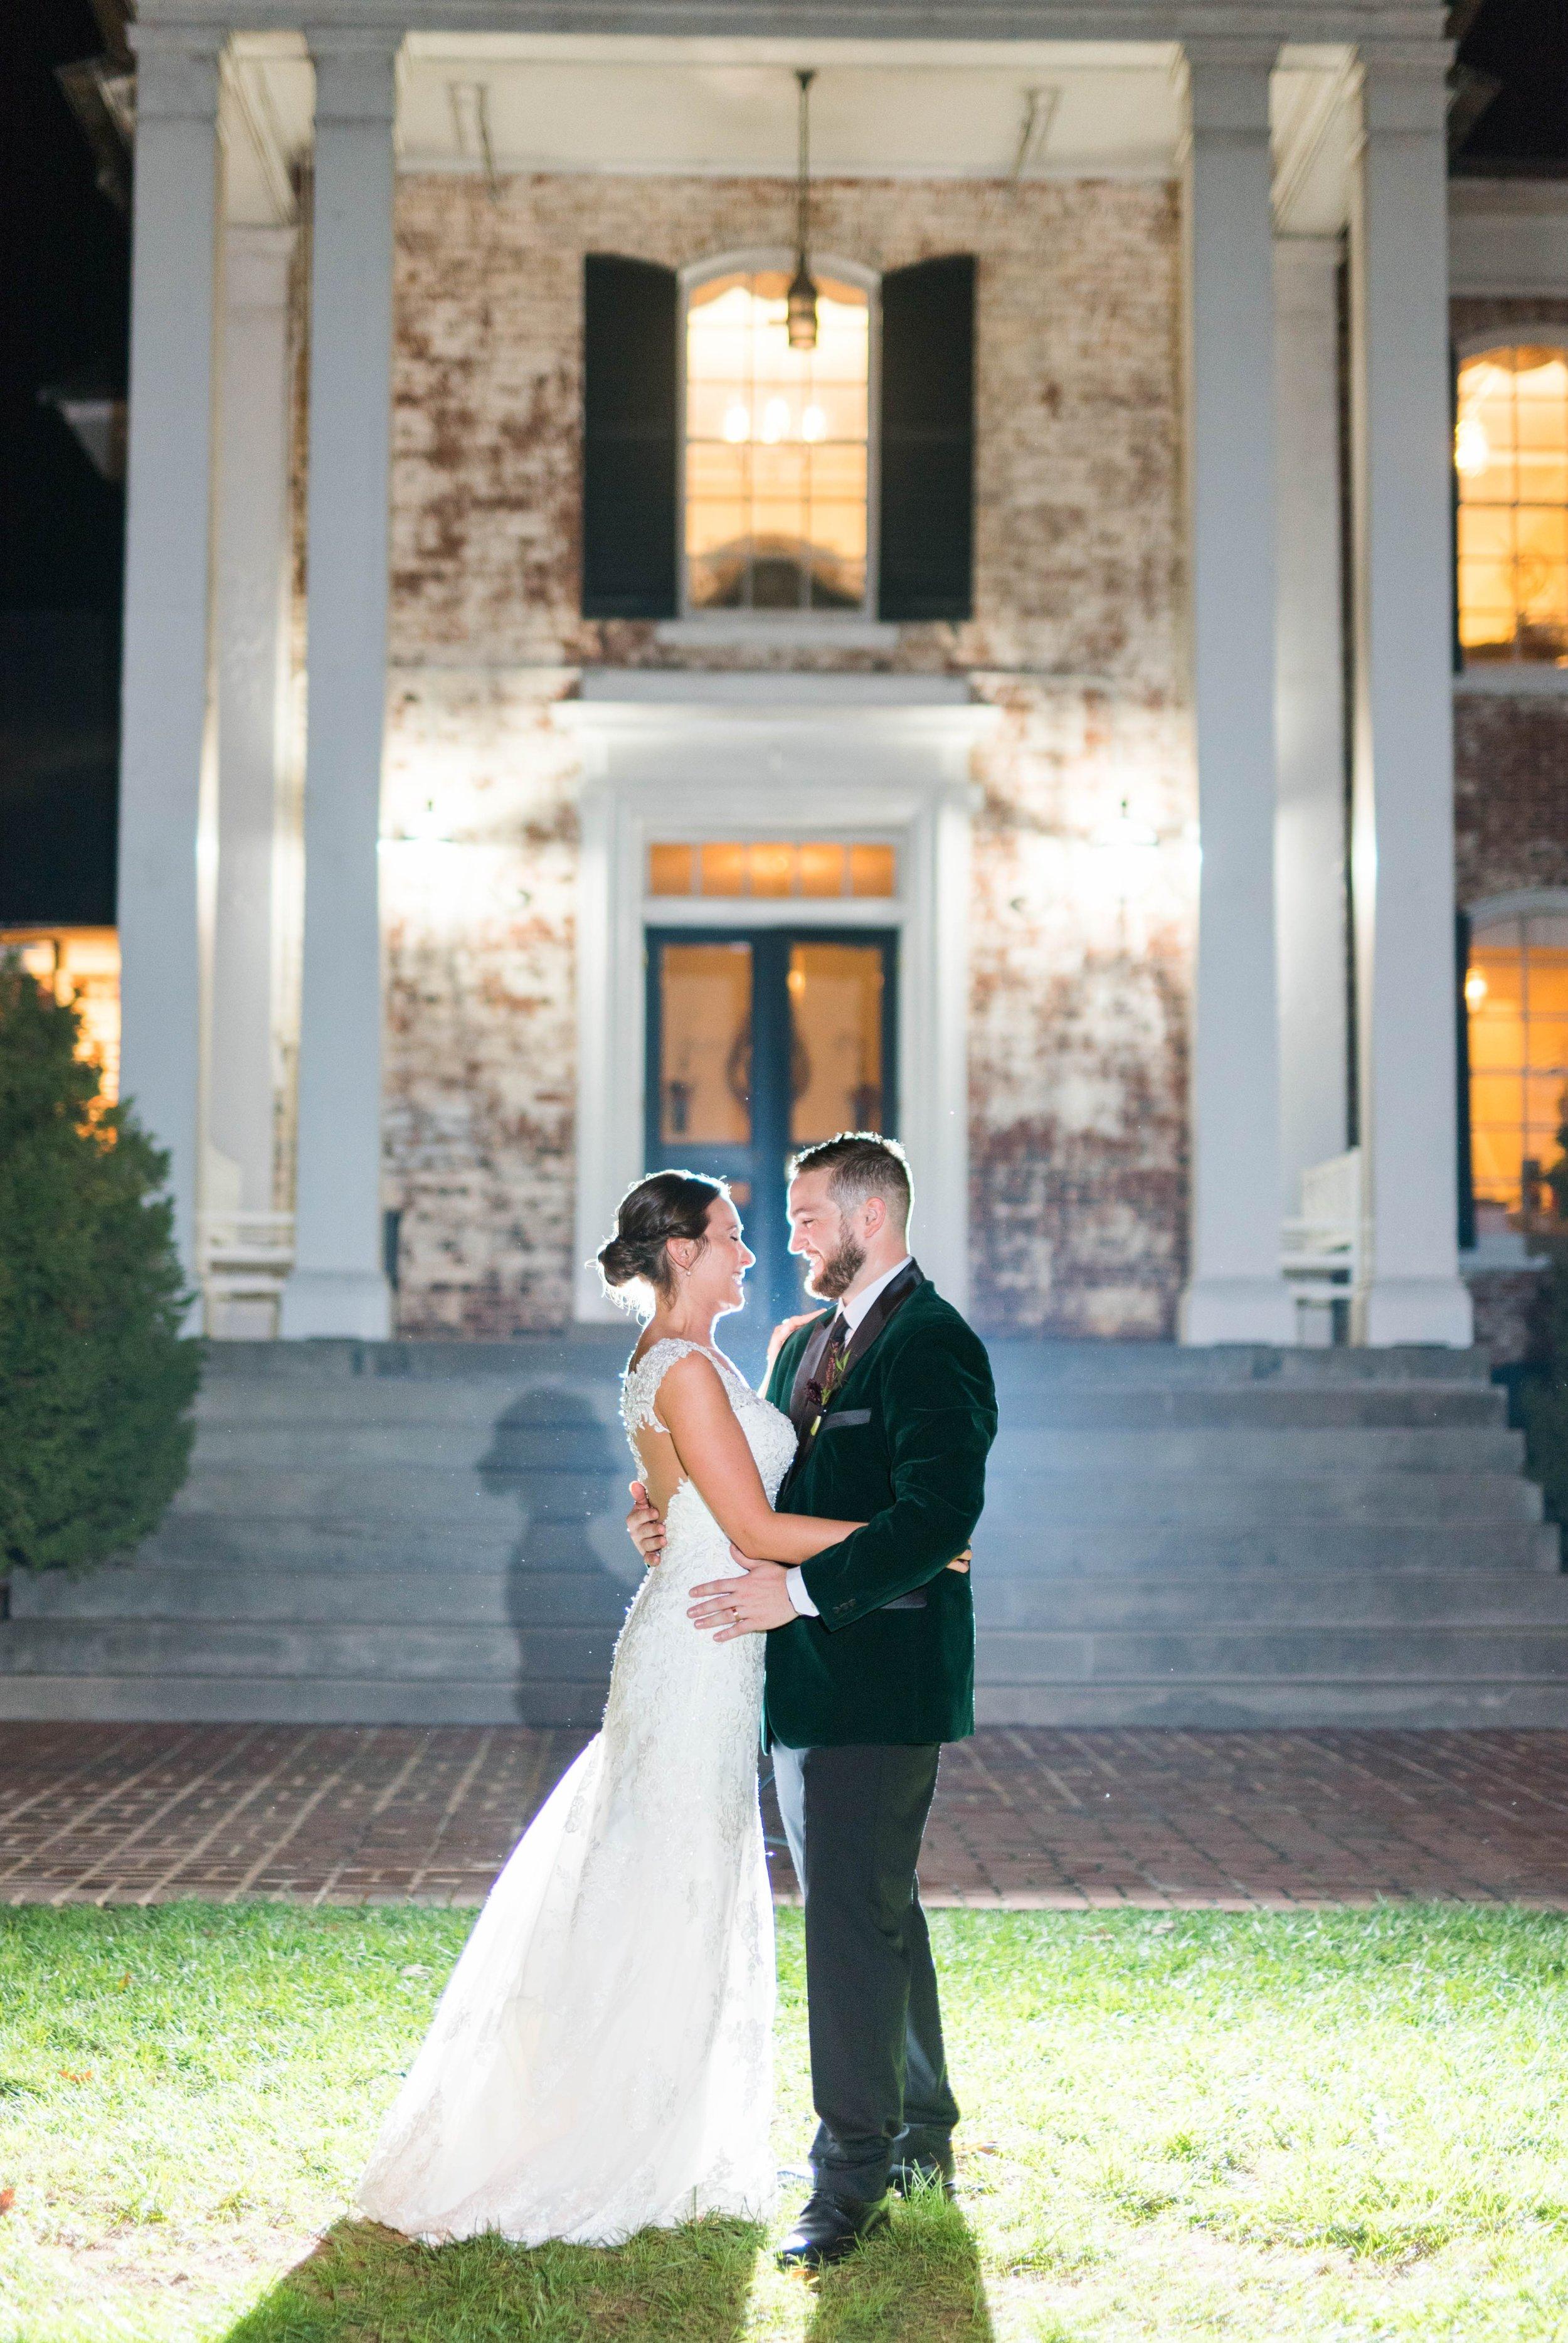 Gordan+Lauren_BoonsboroCountryClubWedding_Virginiaweddingphotographer_LynchburgVi 1.jpg